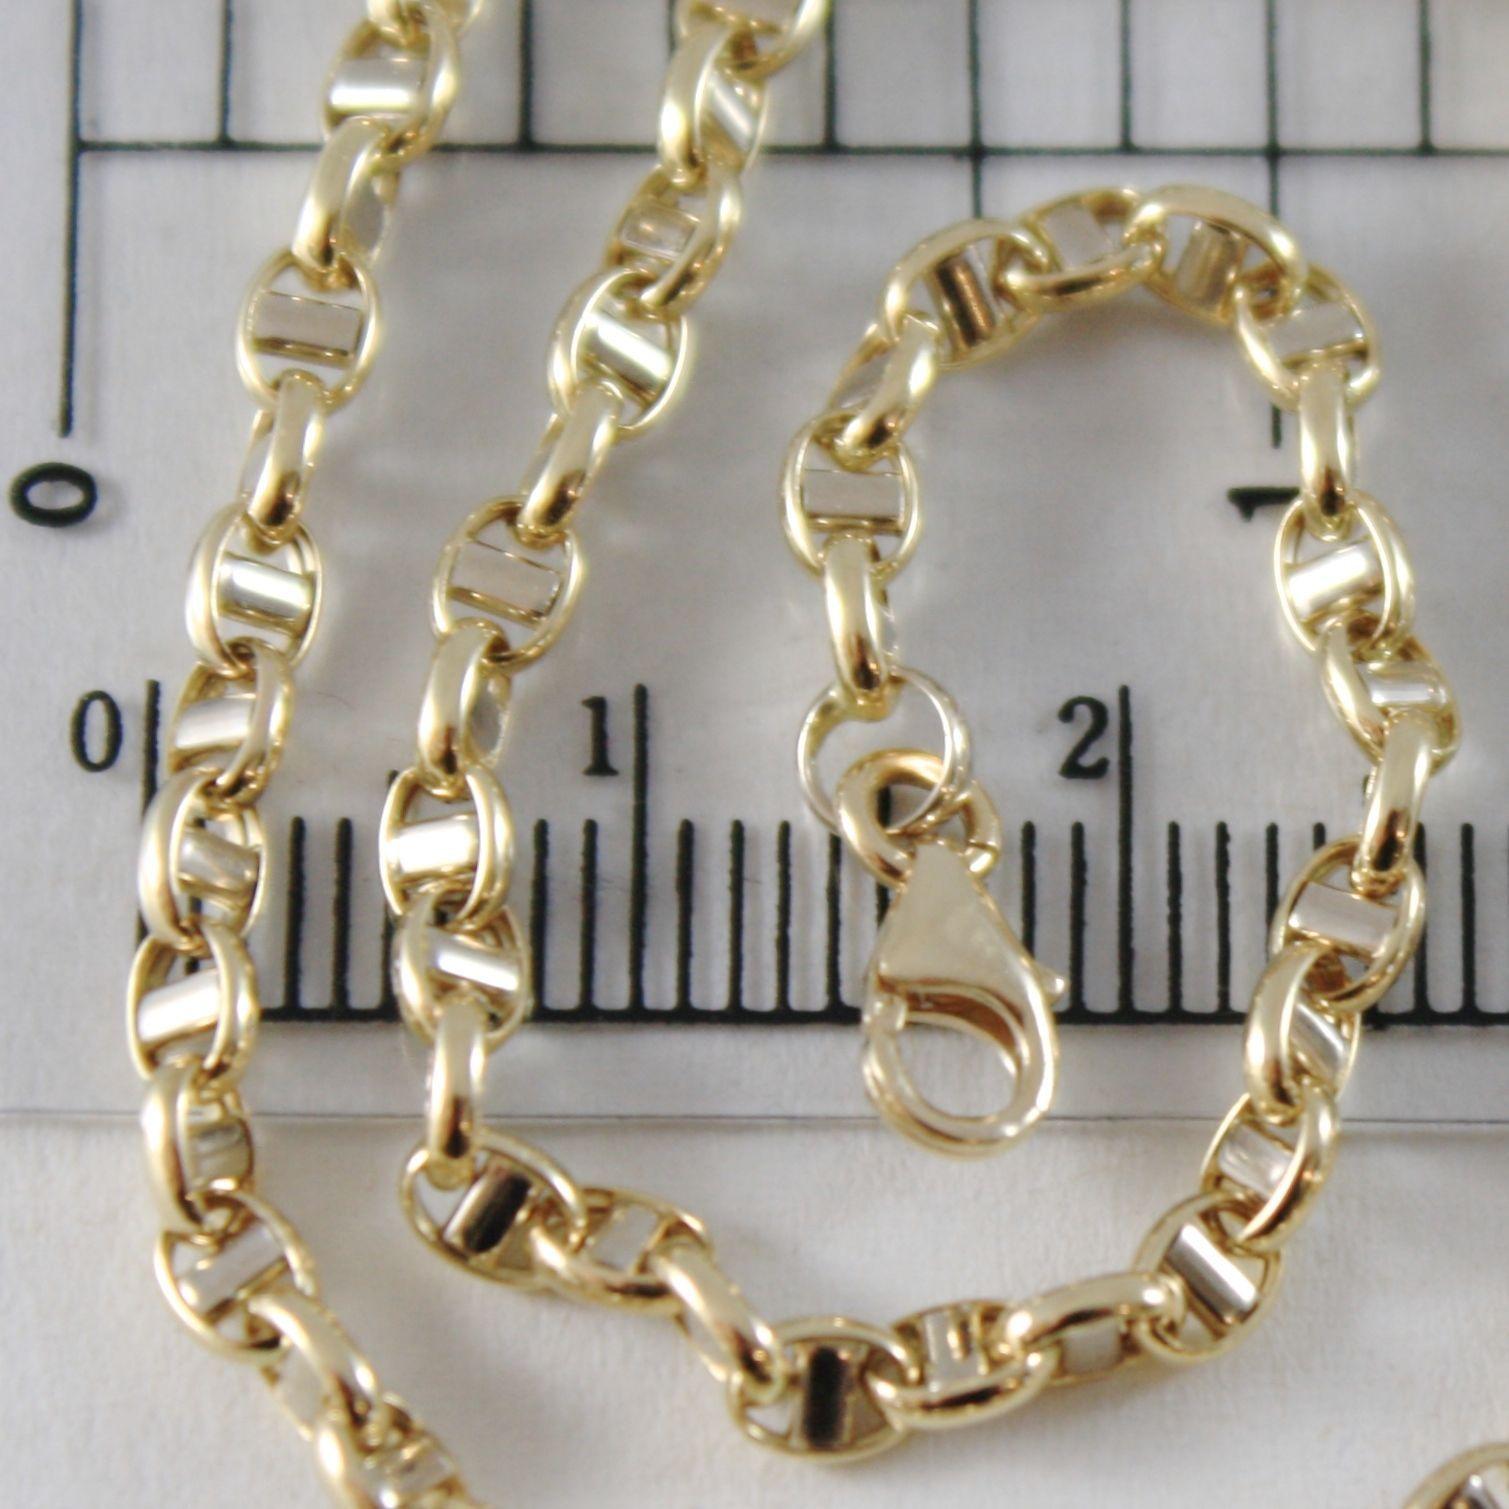 BRACELET YELLOW GOLD 0,5 WHITE 750 18K,19 CM,3 MM,MARINARA CROSSPIECE,ITALY